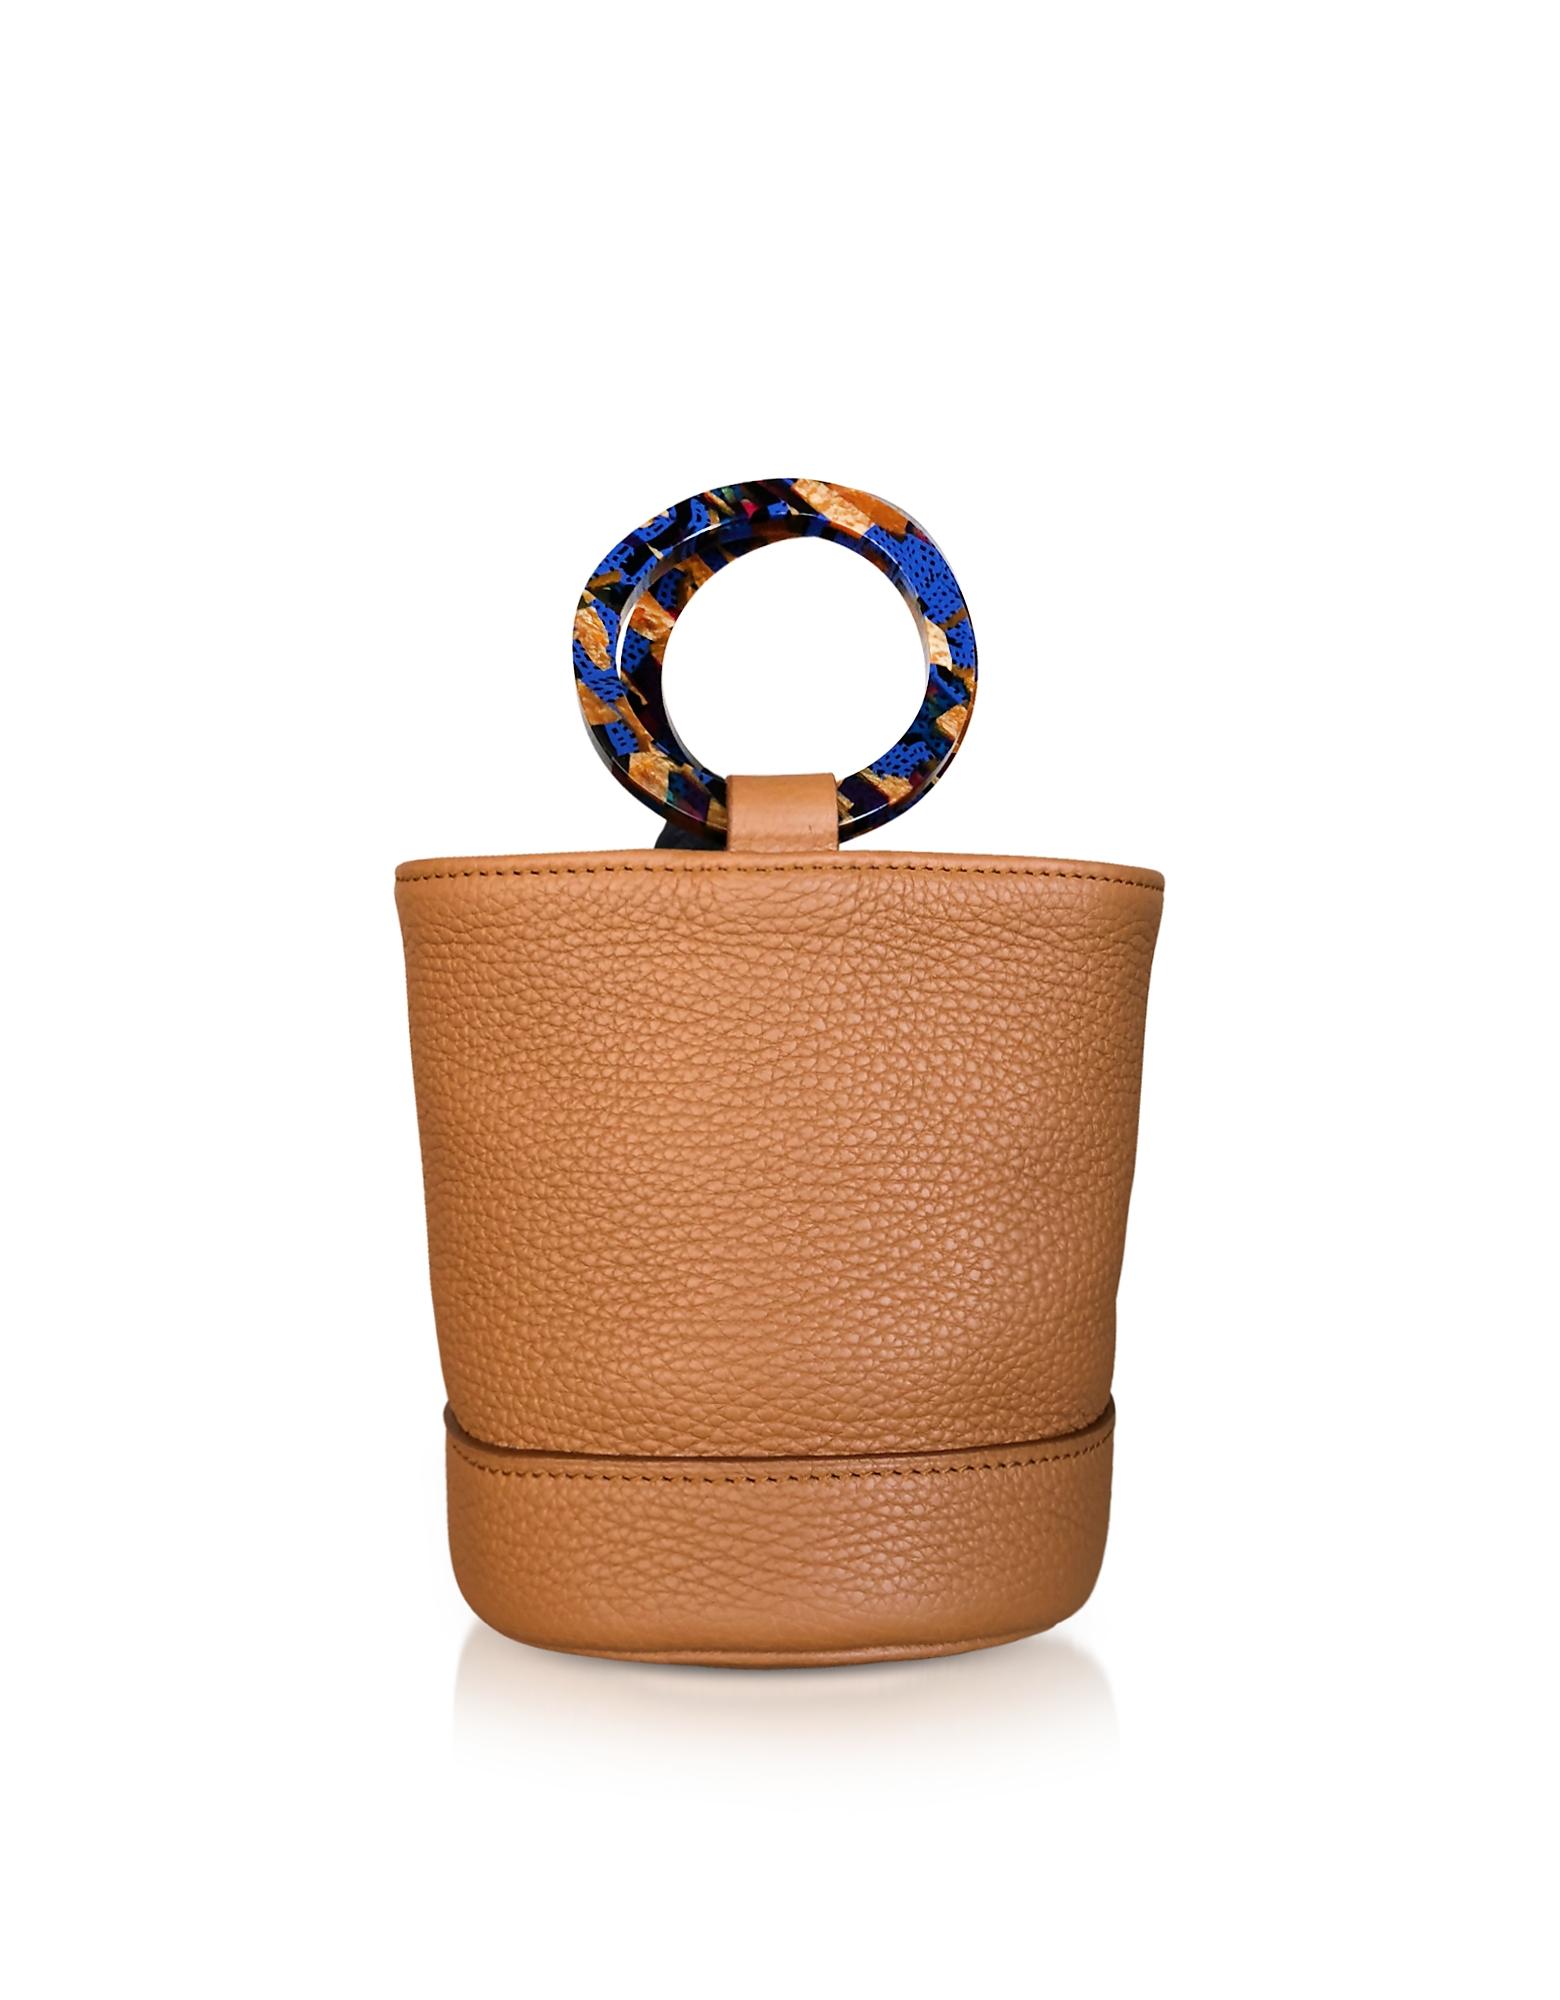 Image of Simon Miller Designer Handbags, Tan Leather Bonsai 15cm Bag